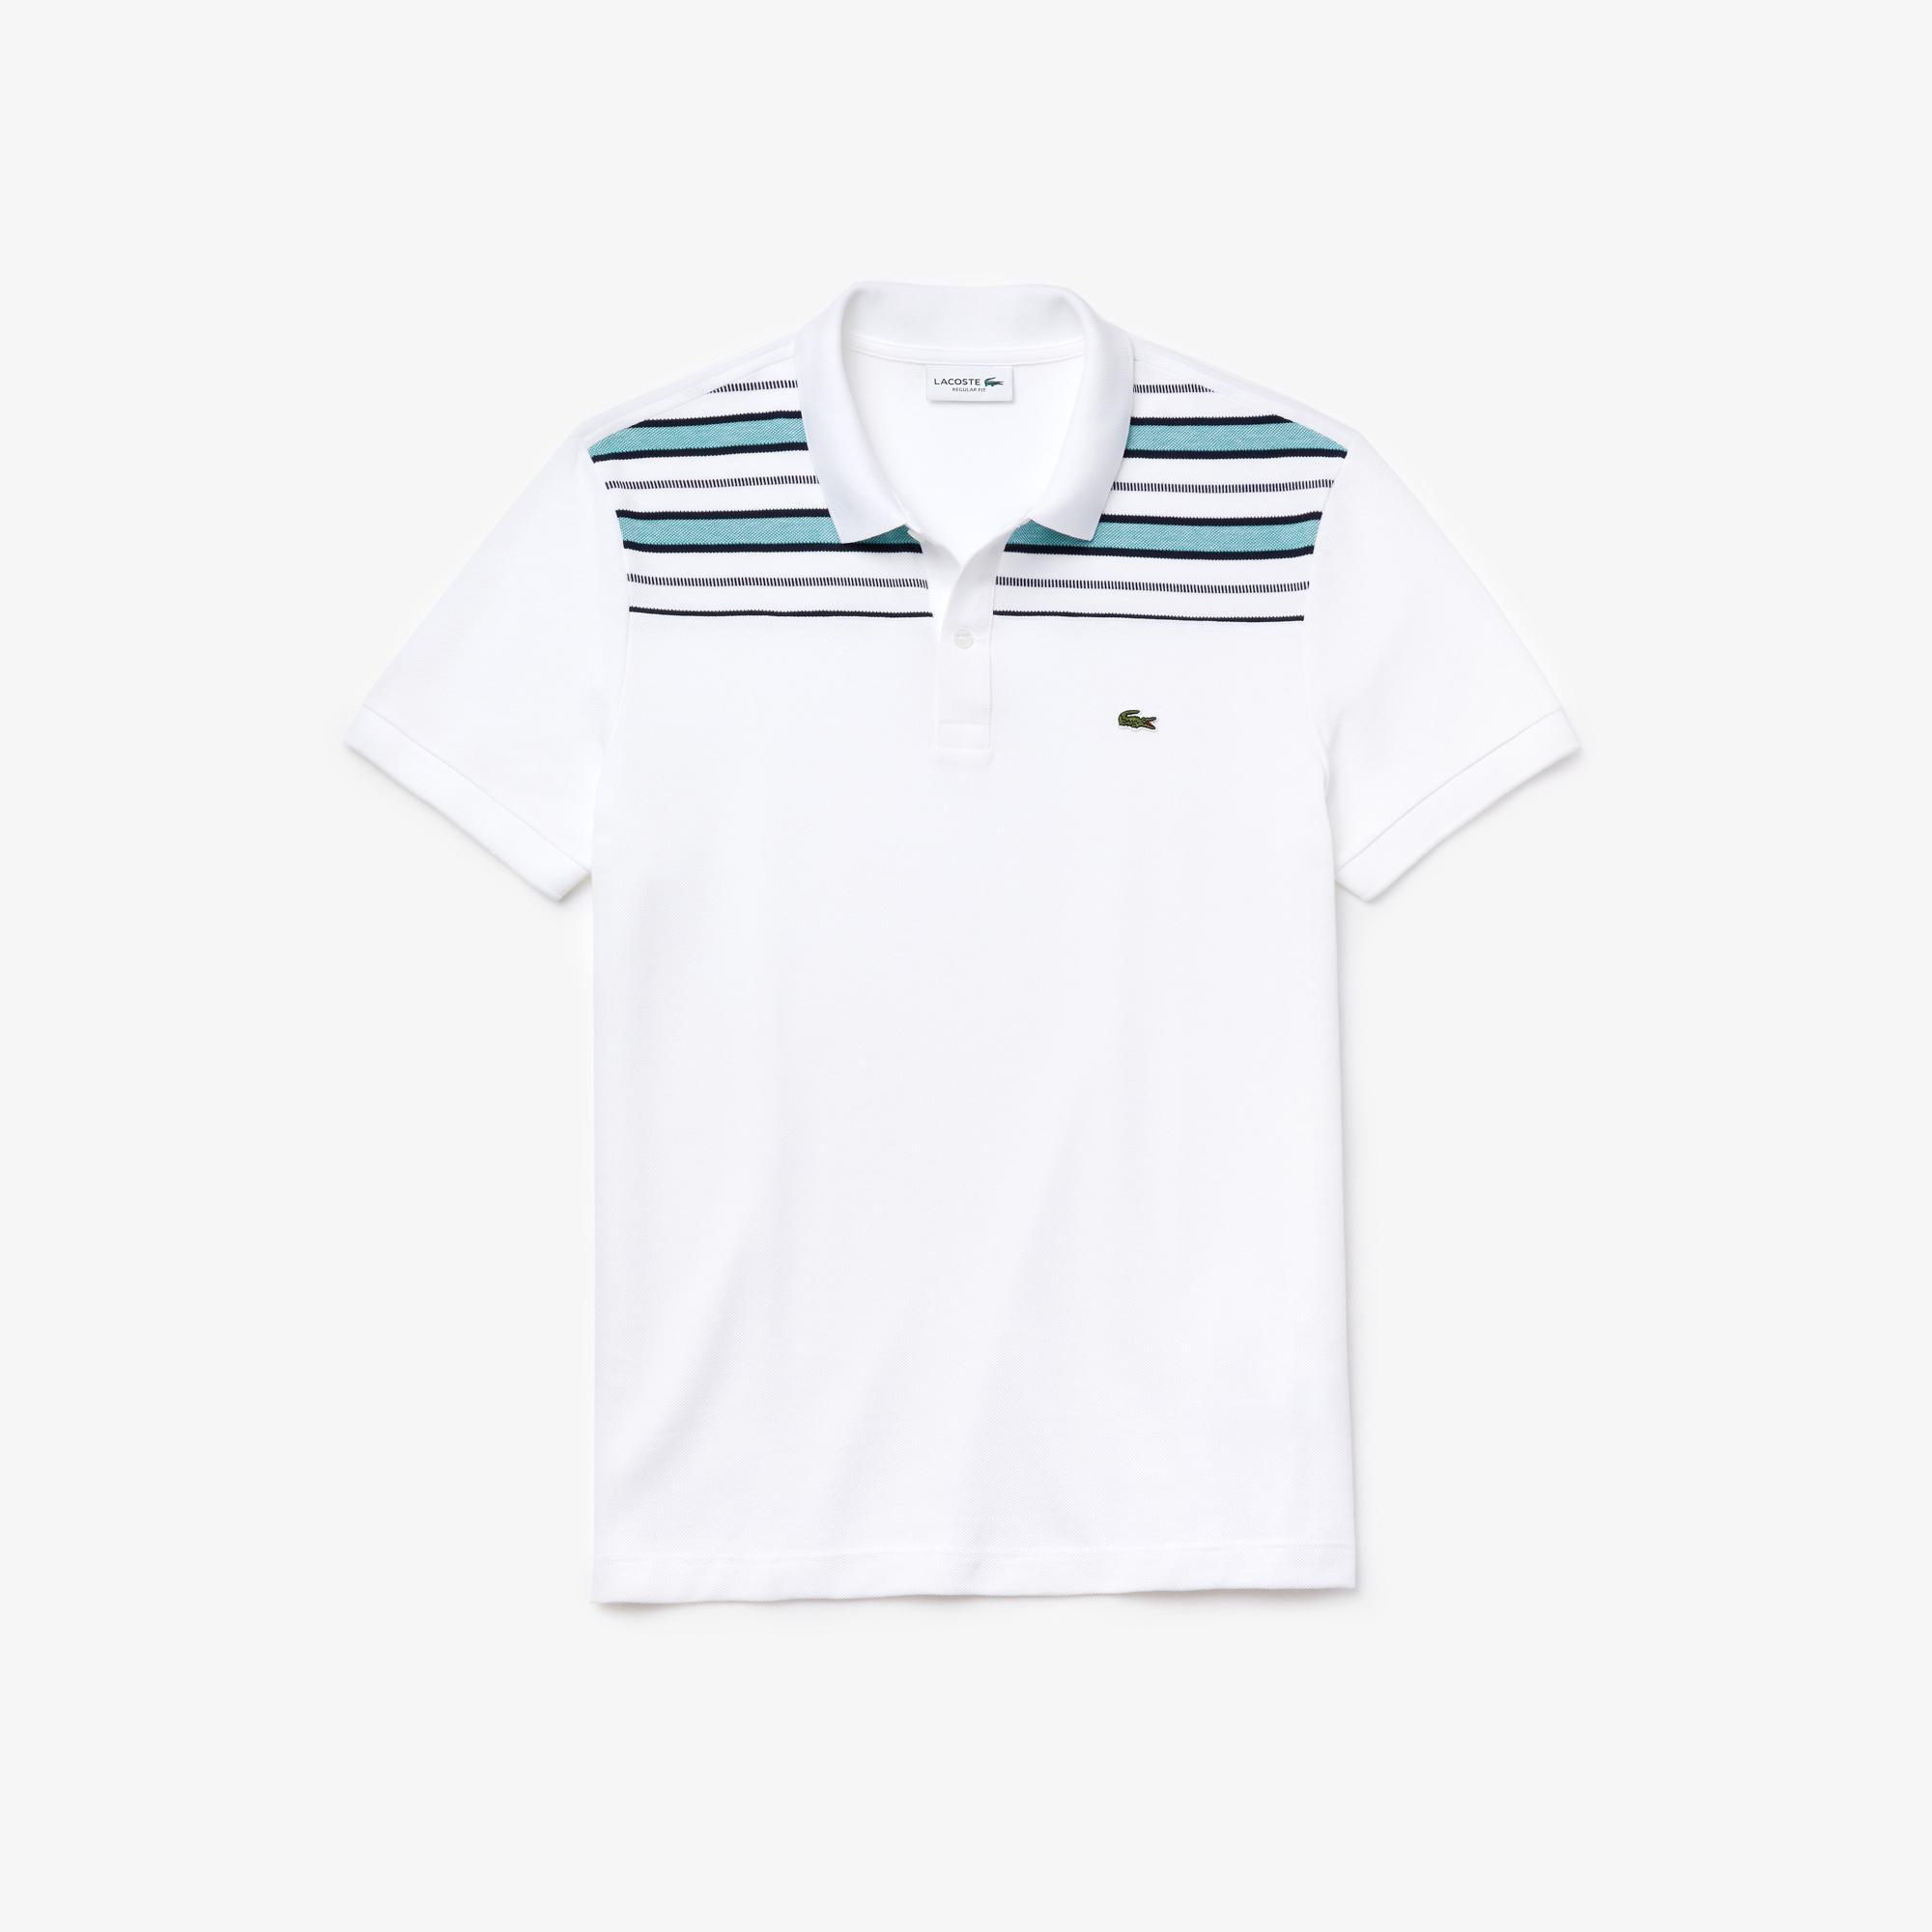 Lacoste Men's Striped Pane Polo